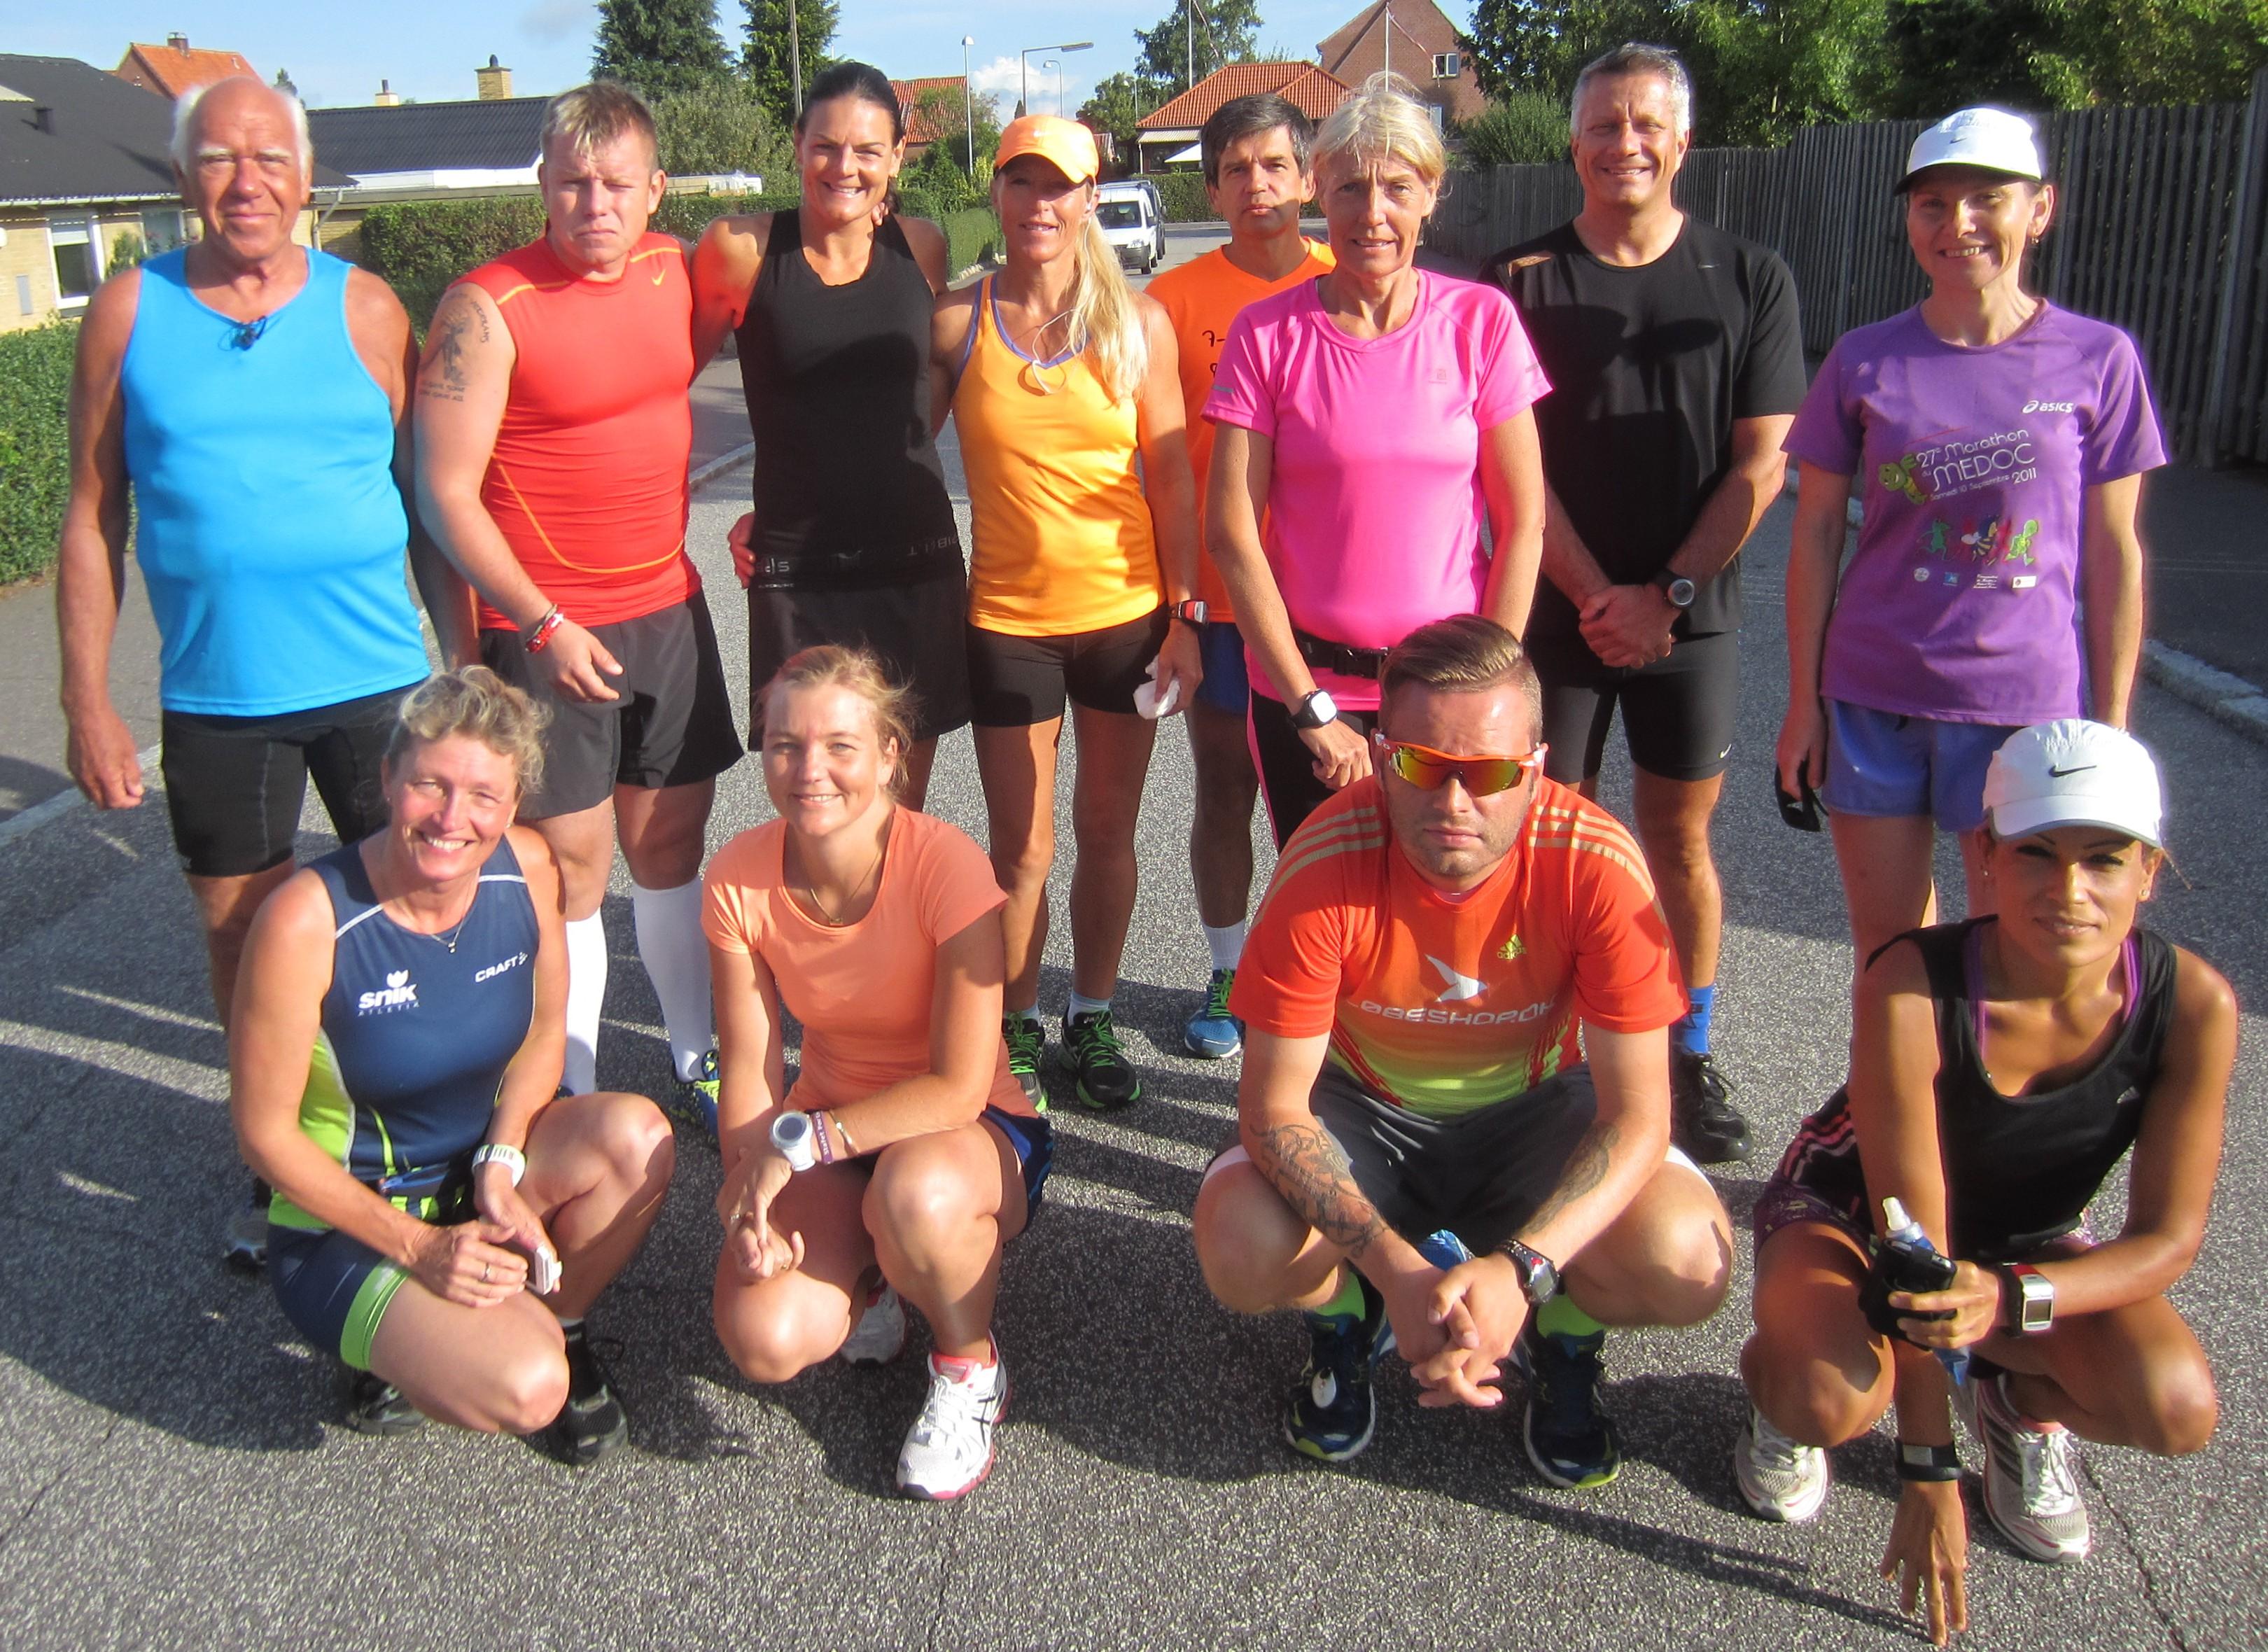 Tak for nu fredskov marathon for Annette hein